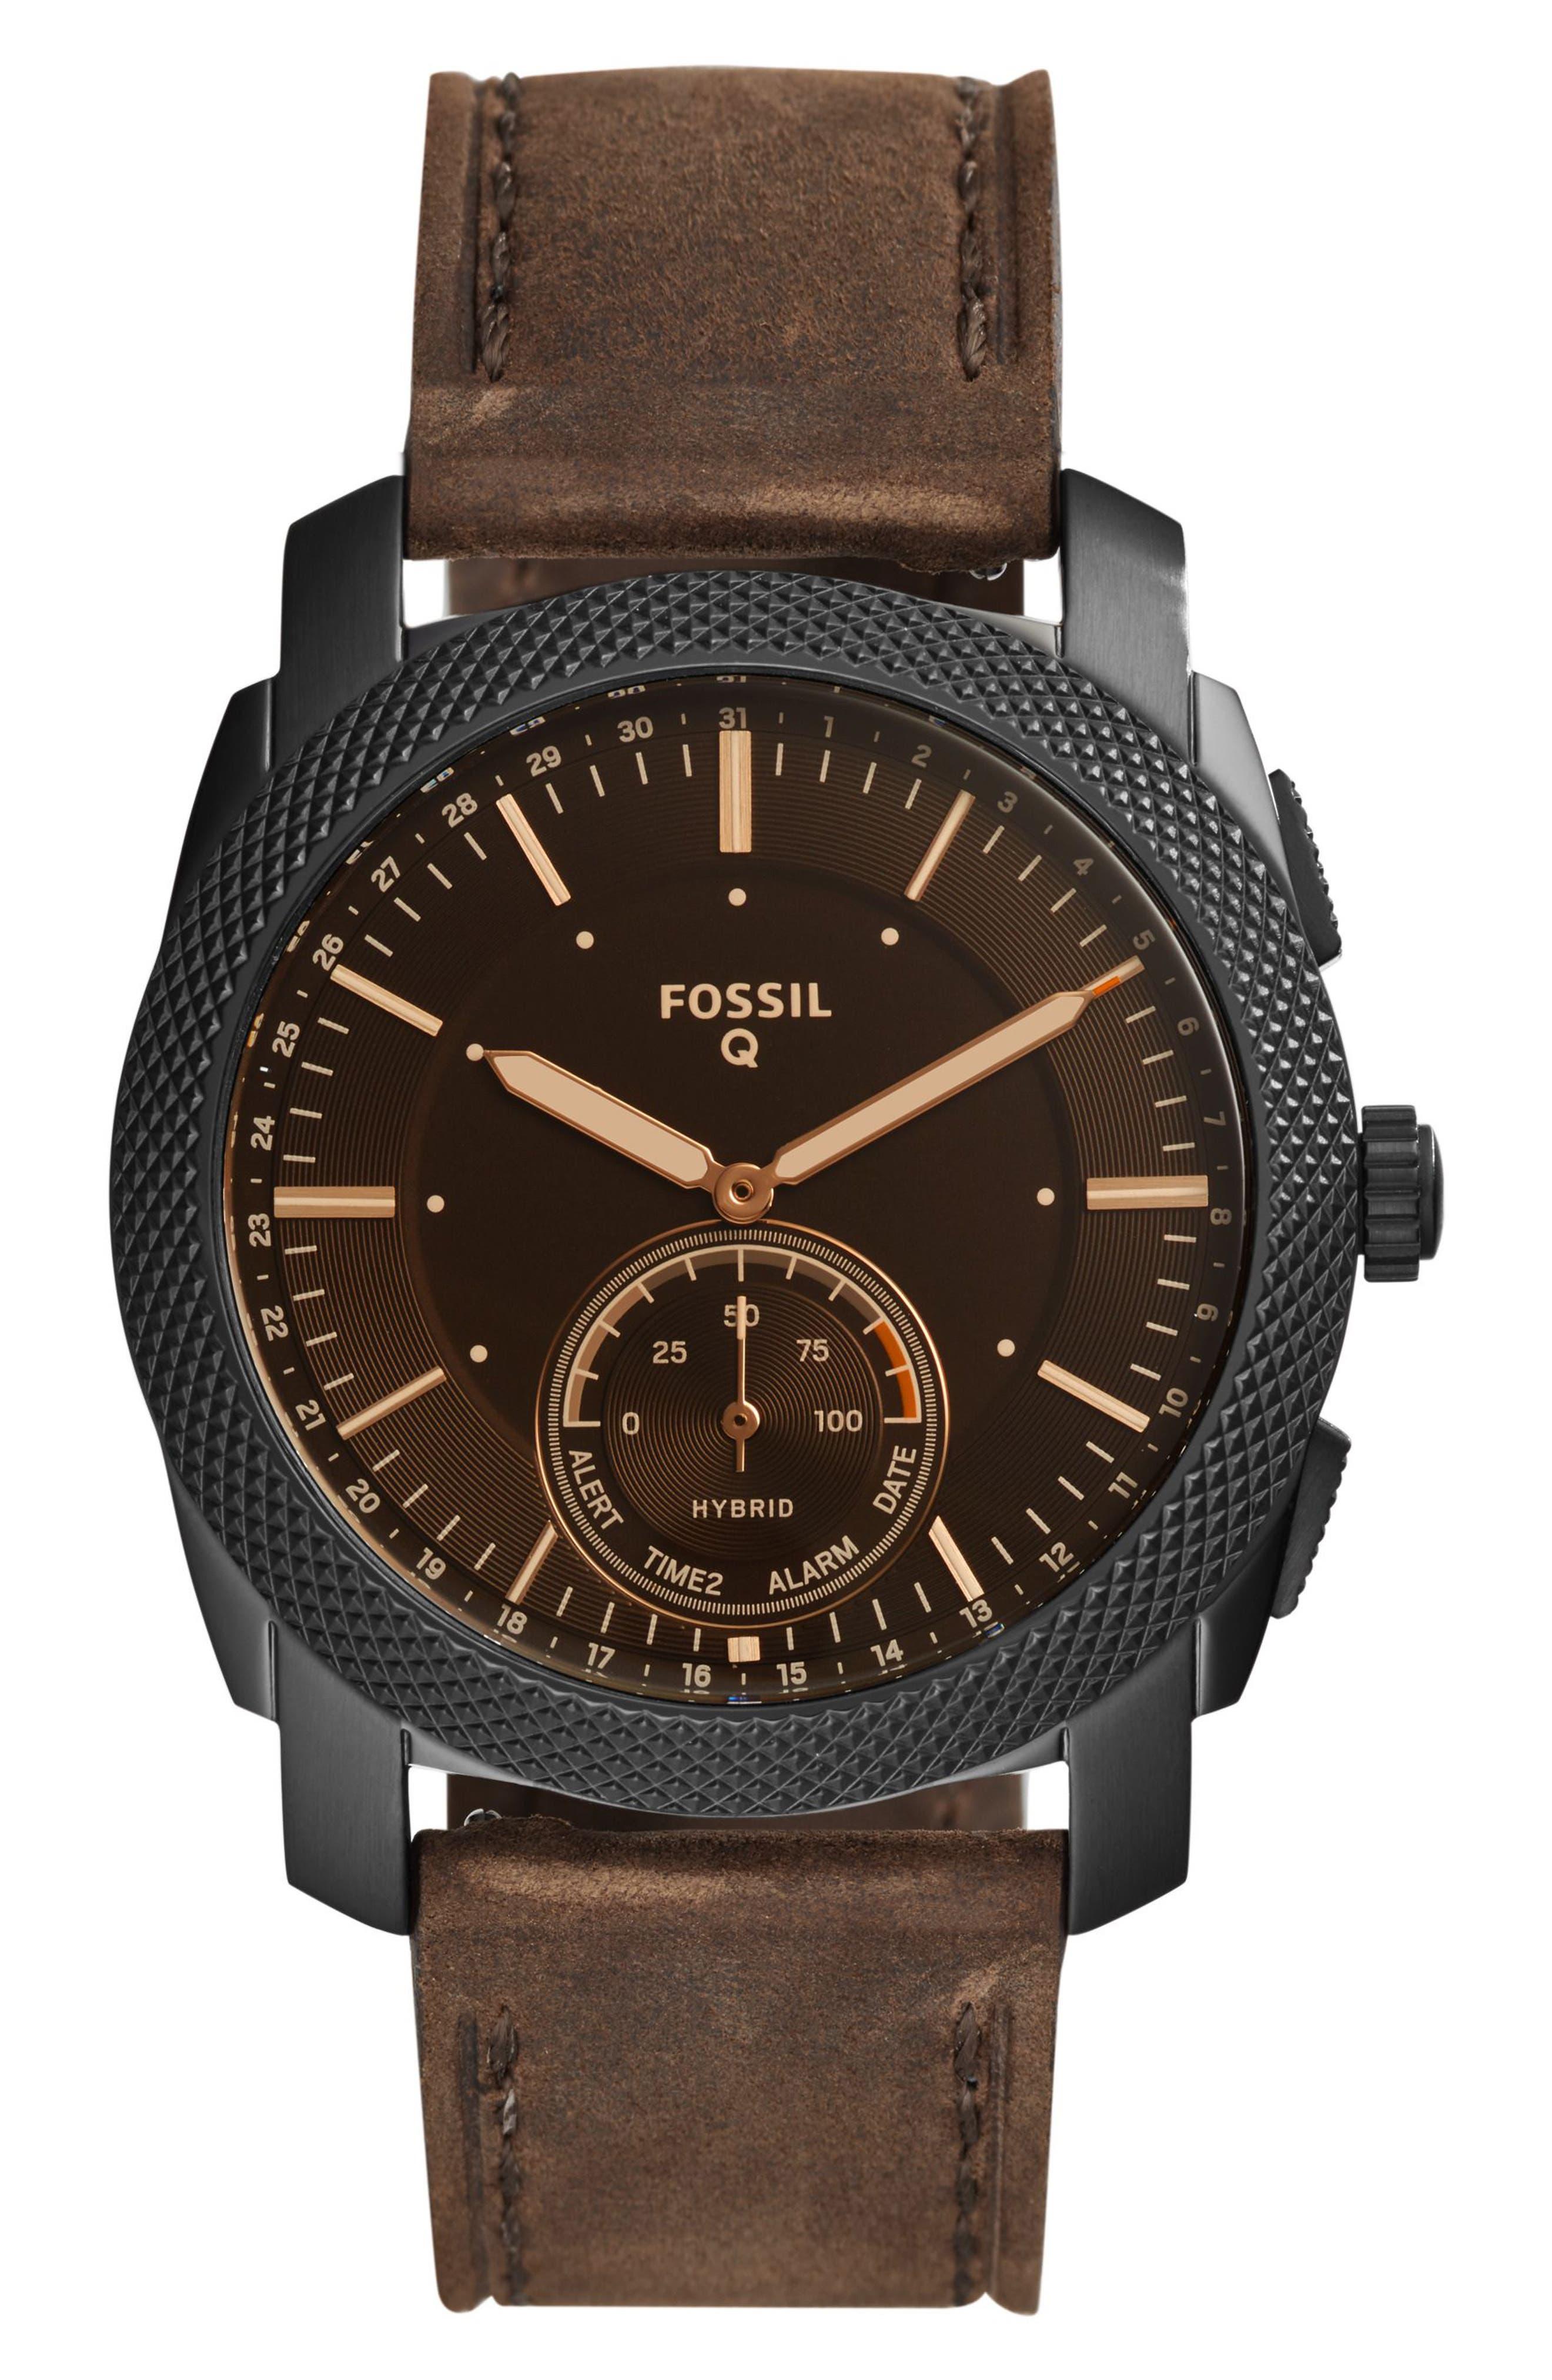 Fossil Q Machine Leather Strap Hybrid Smart Watch, 45mm